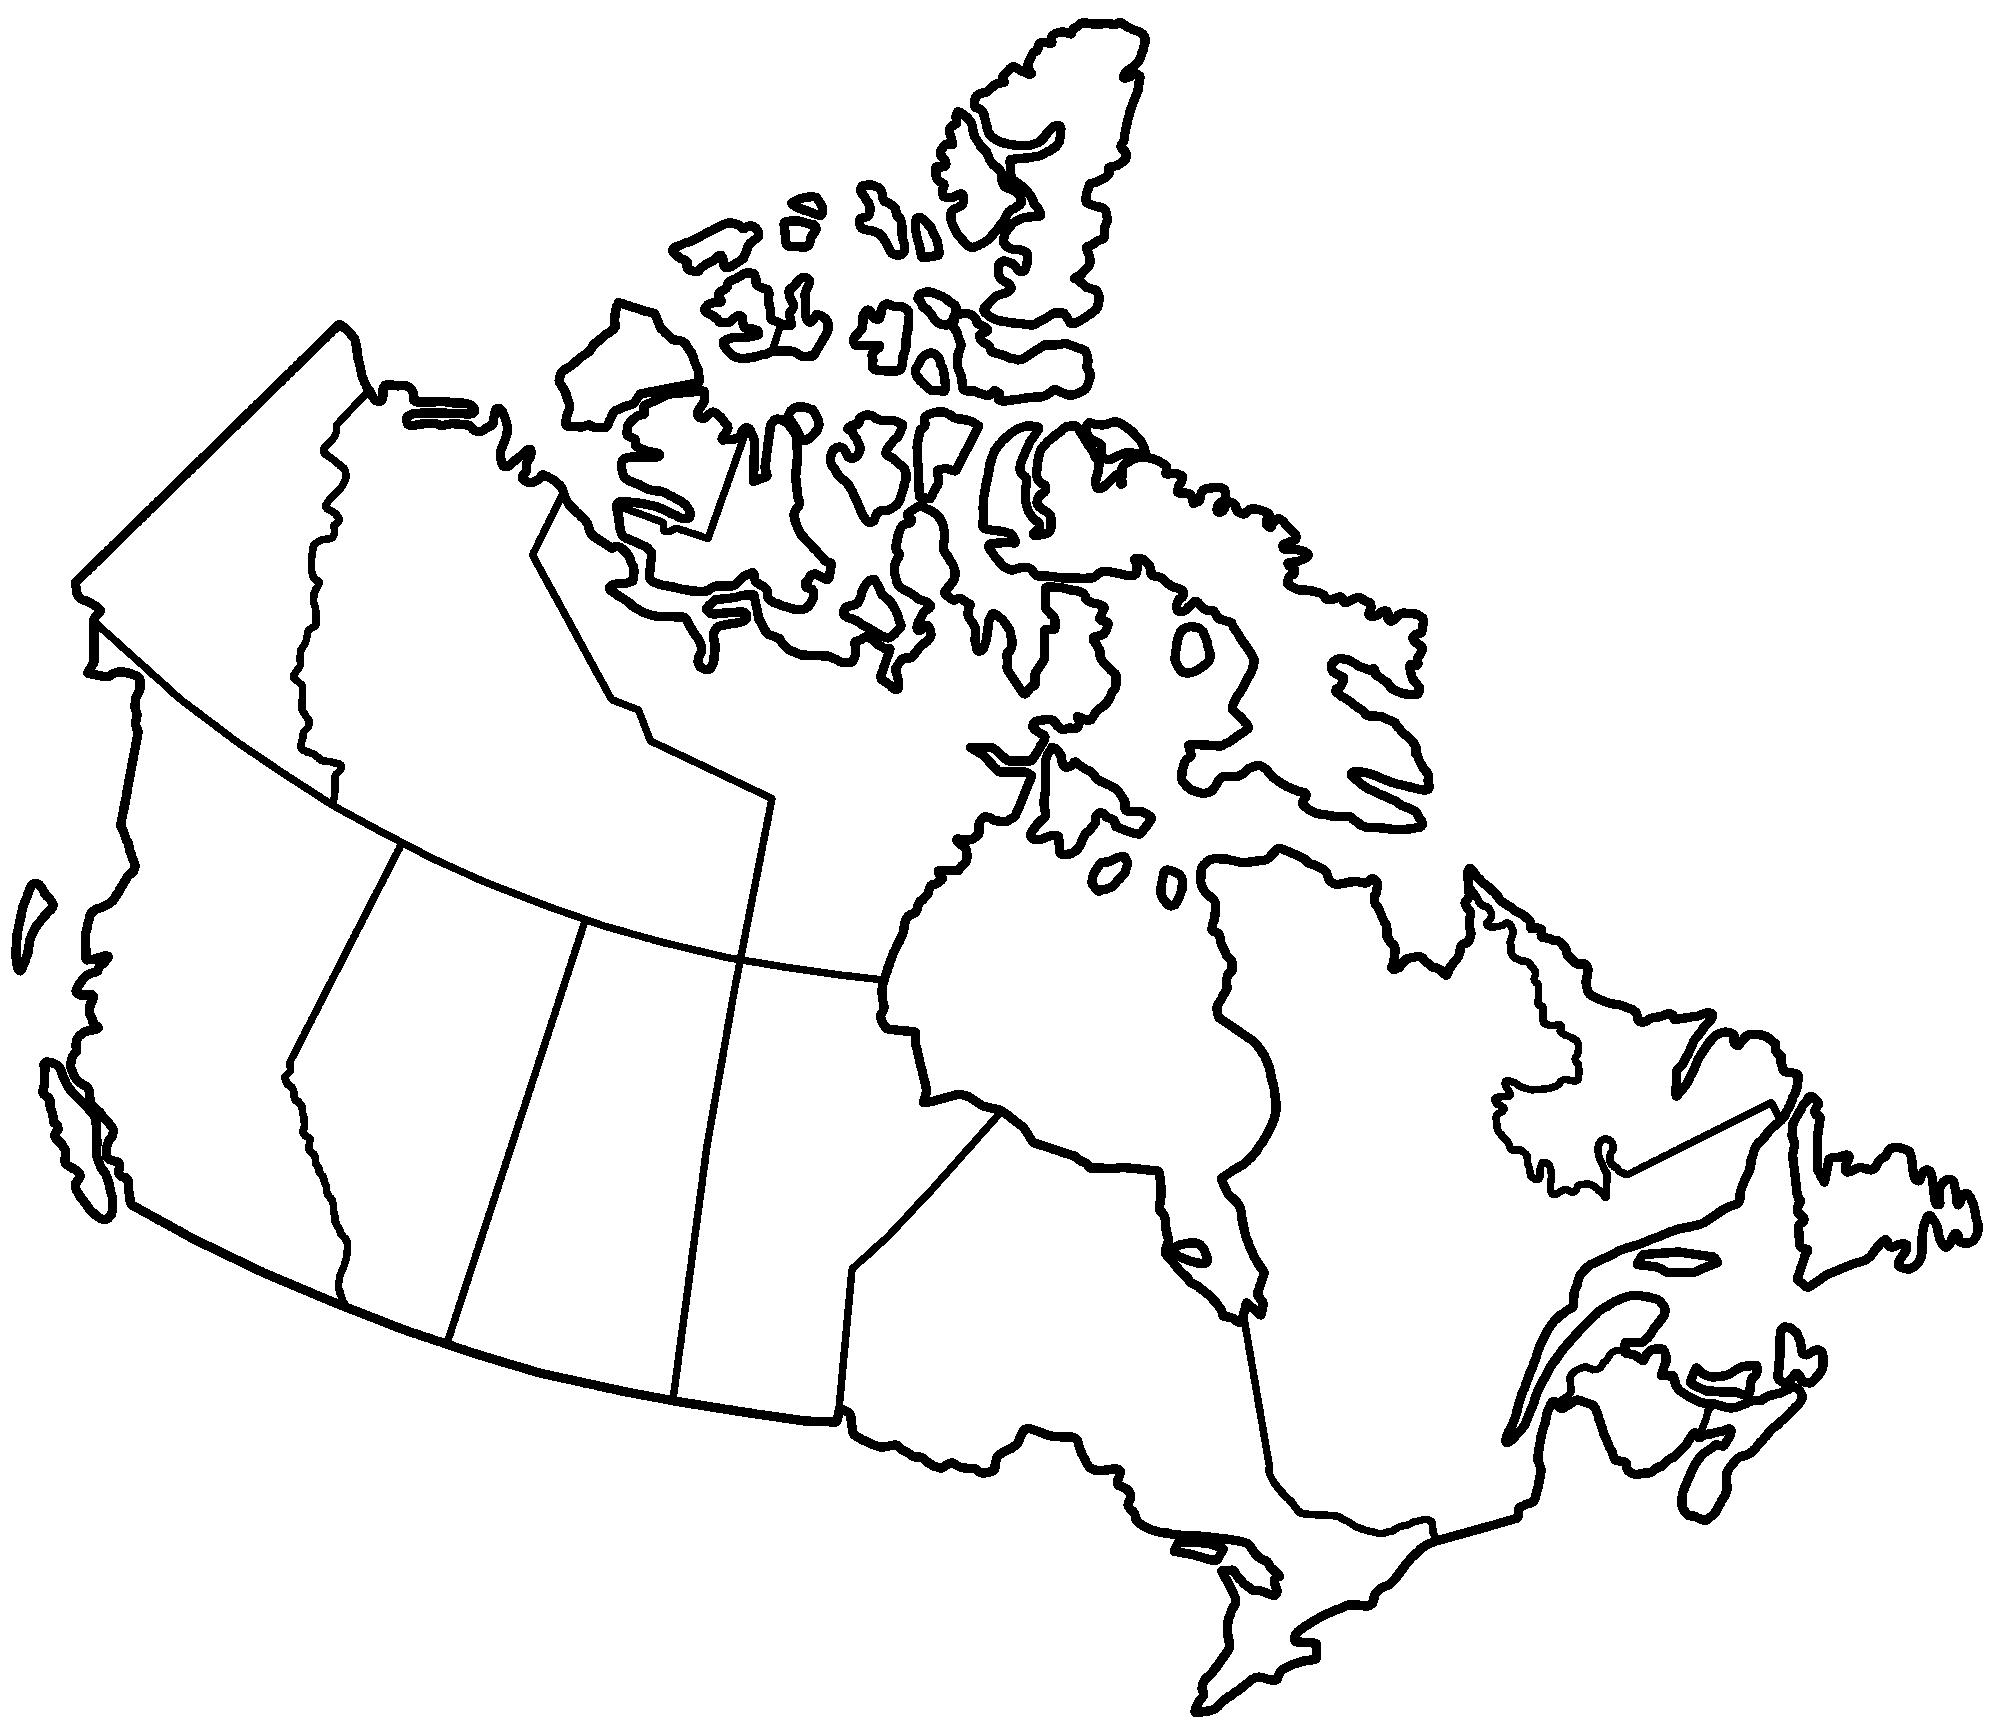 Of Canada Blank.